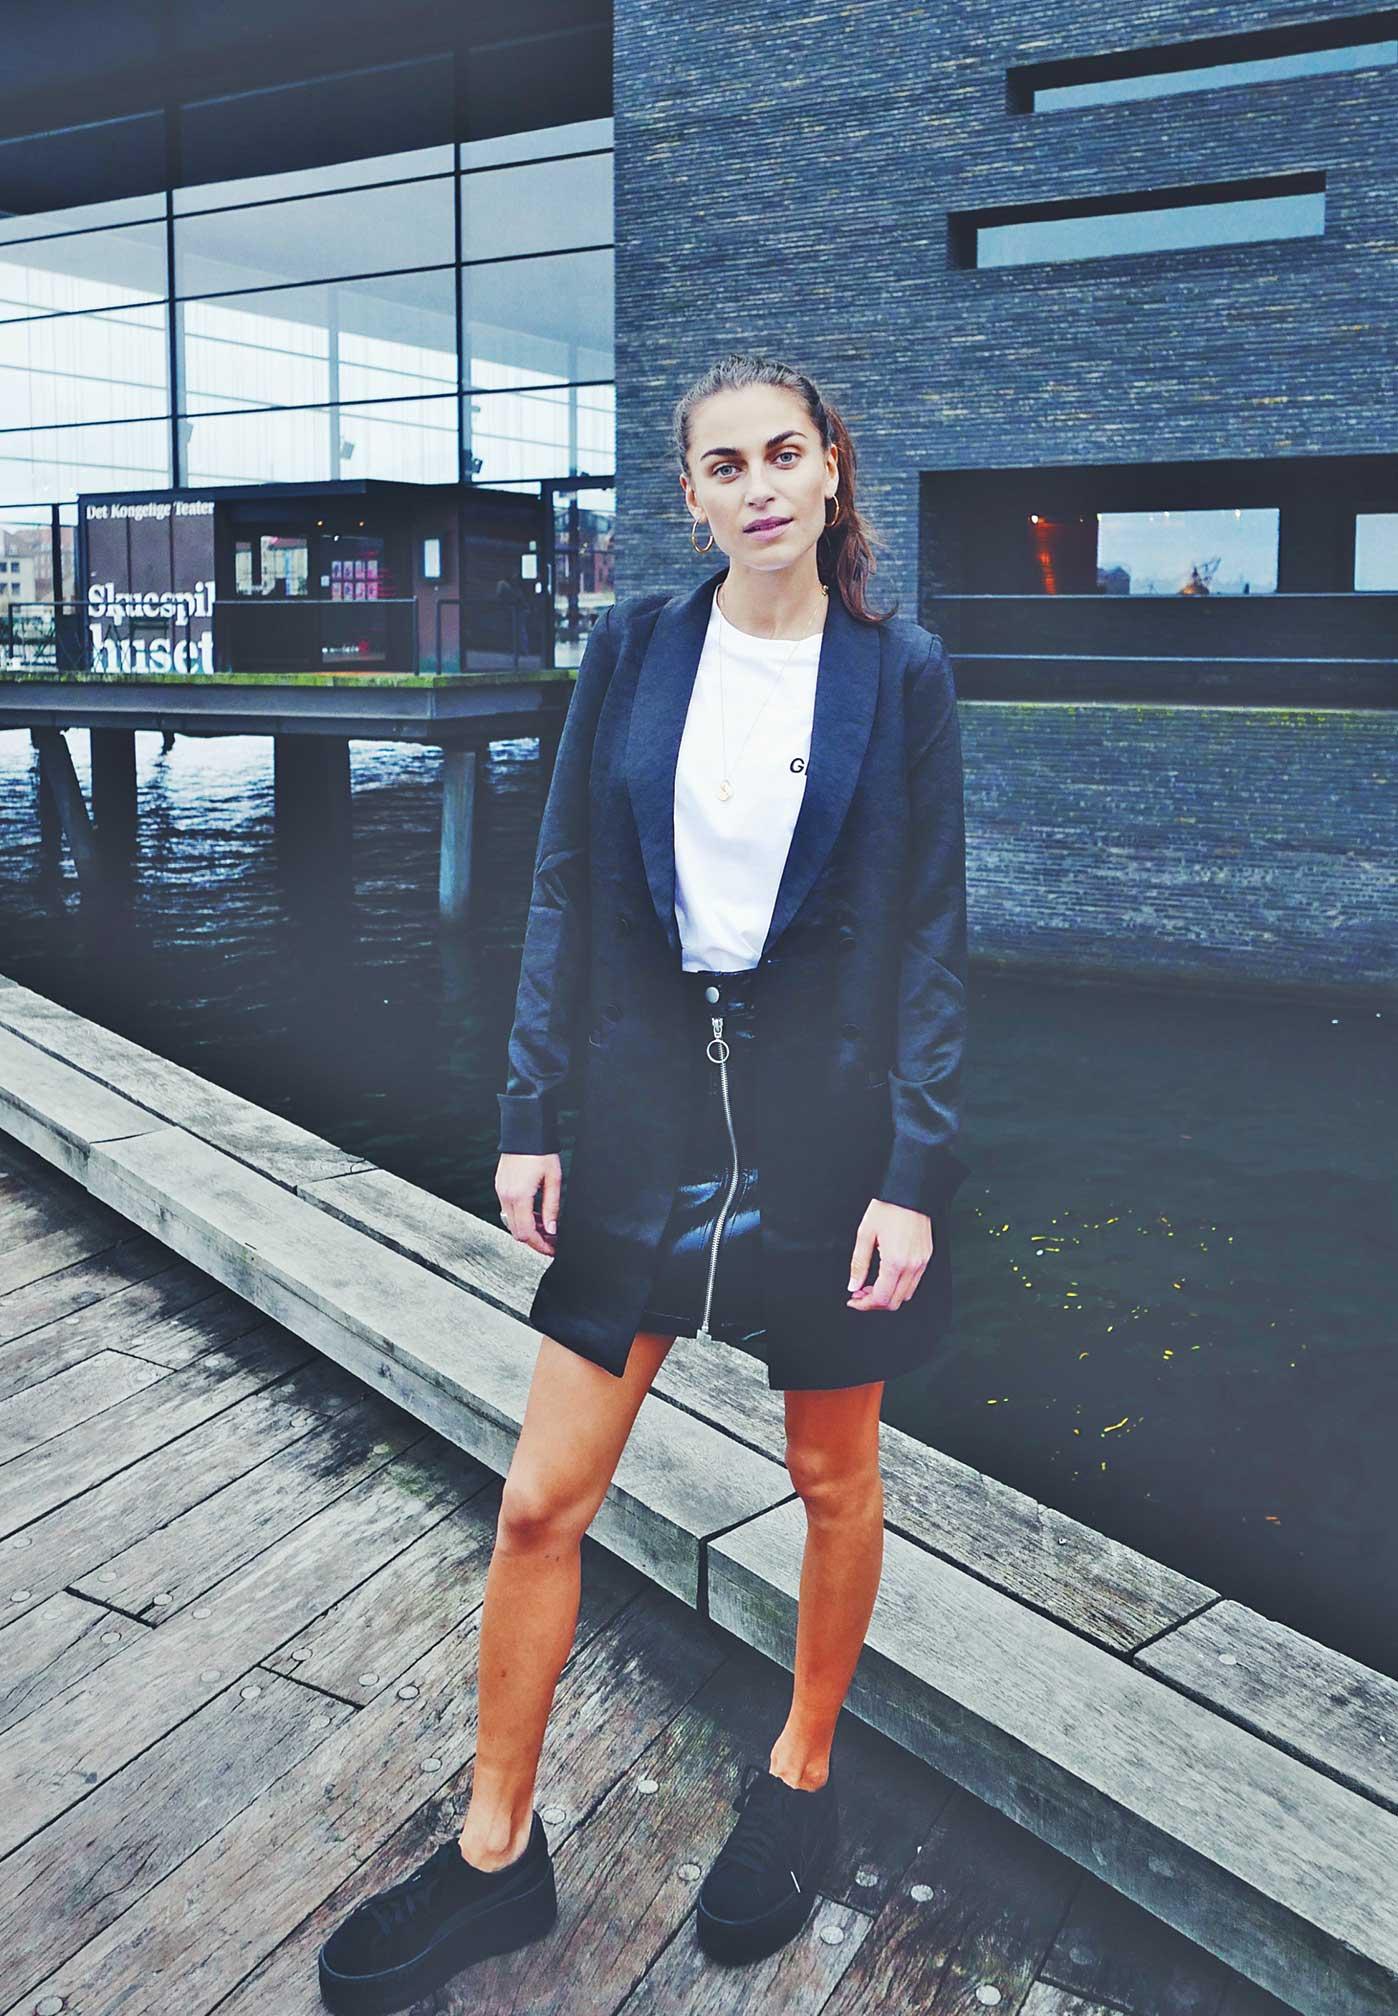 Julie am Hafen Kopenhagen